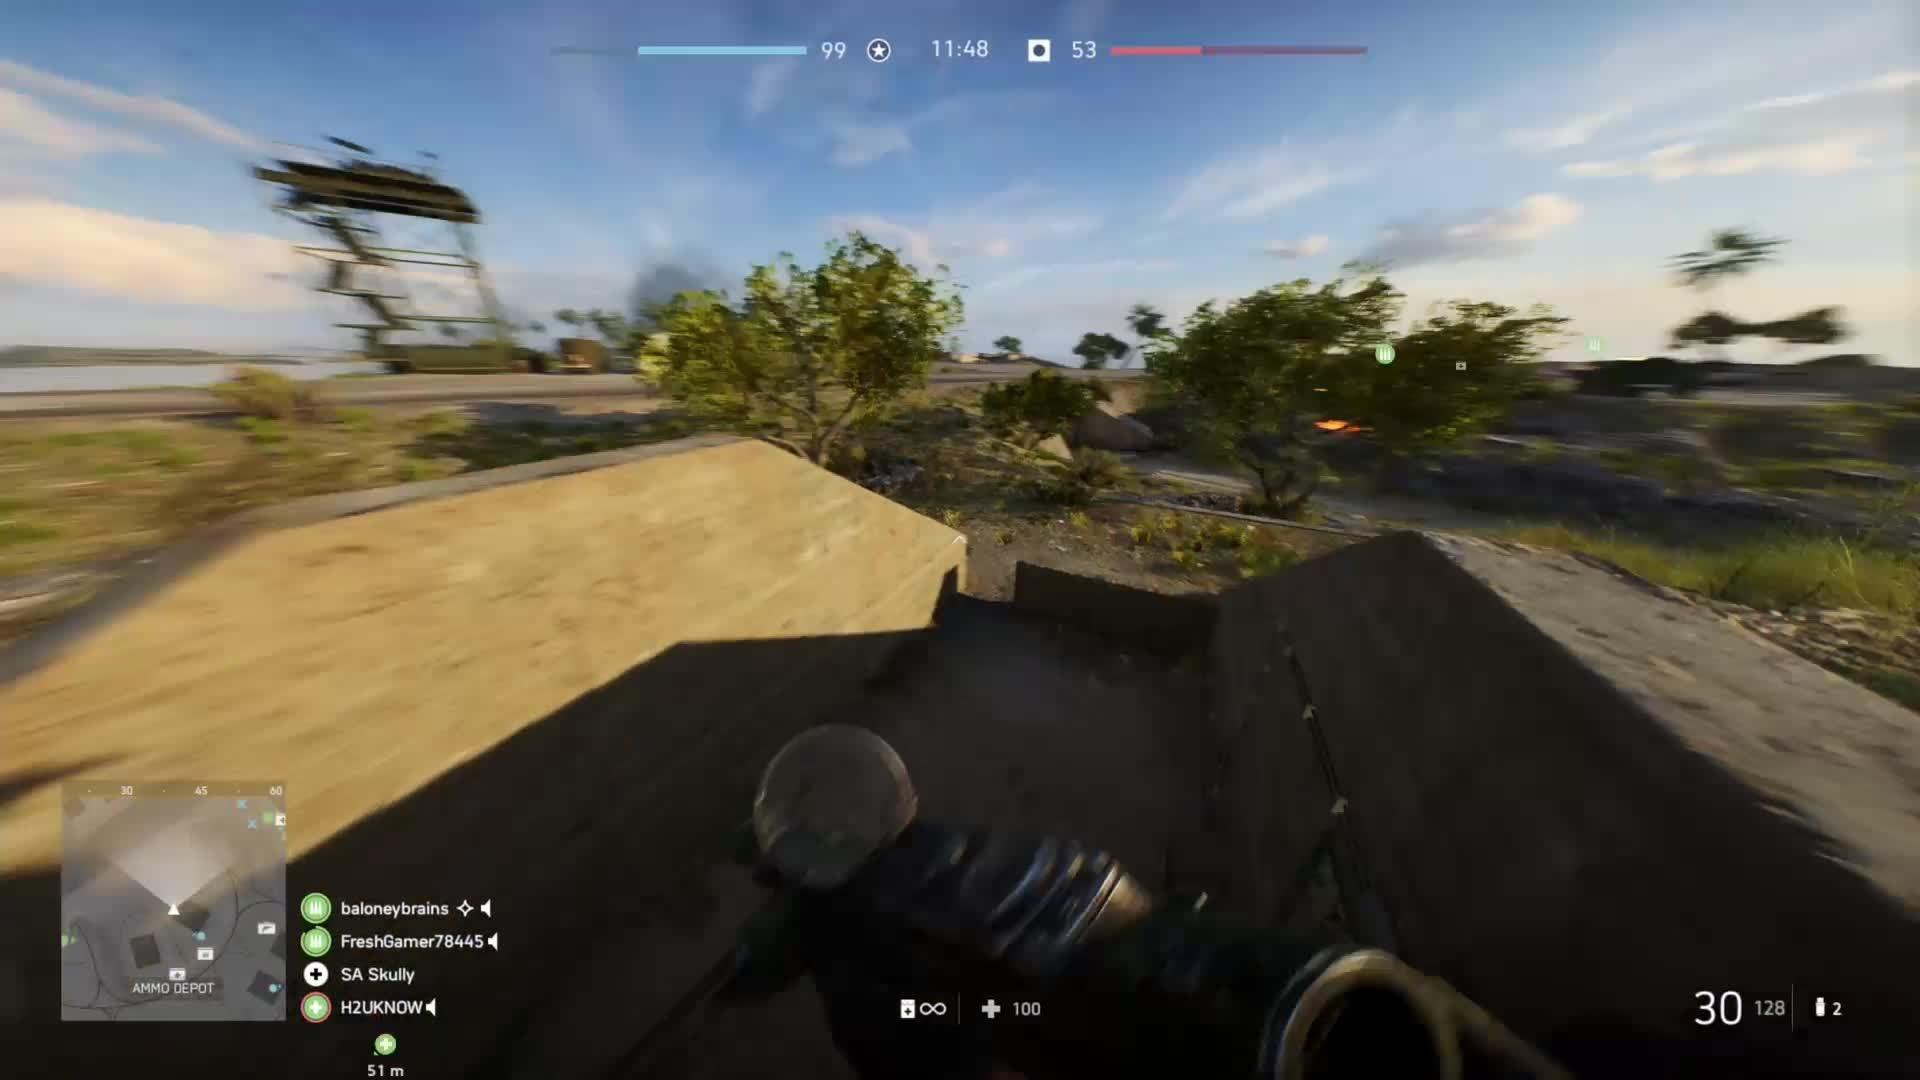 Battlefield: General - TDM video cover image 0